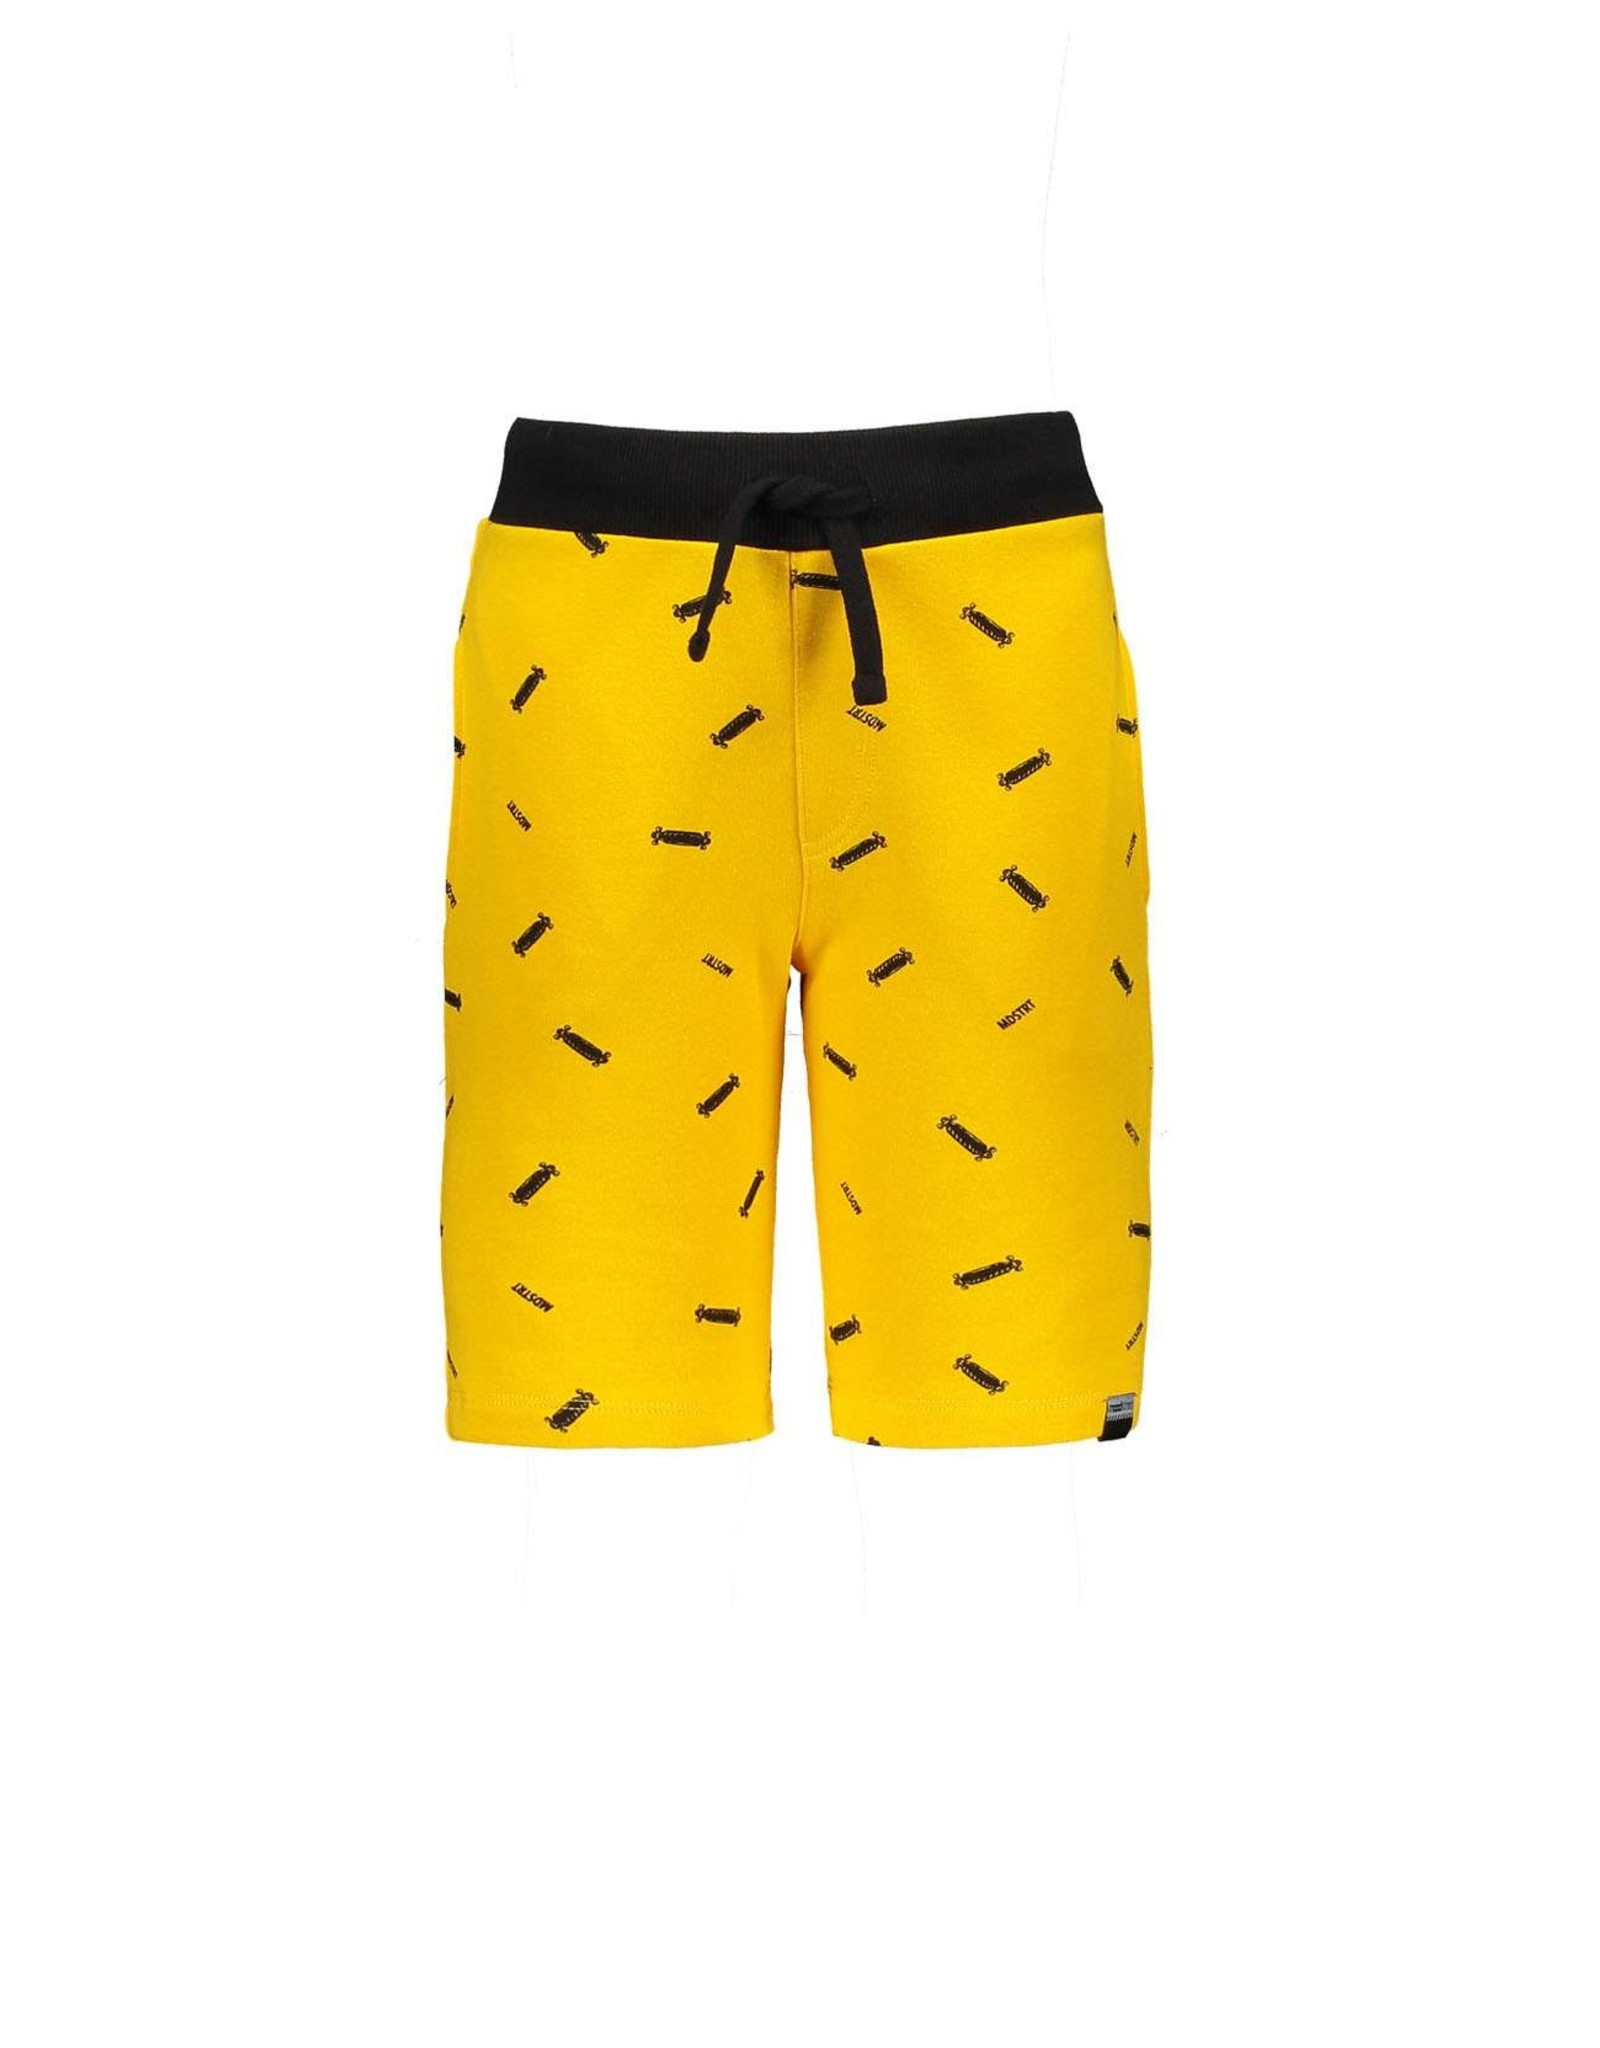 "Moodstreet Moodstreet-MT Short AOP Logo-""Dark Yellow"""